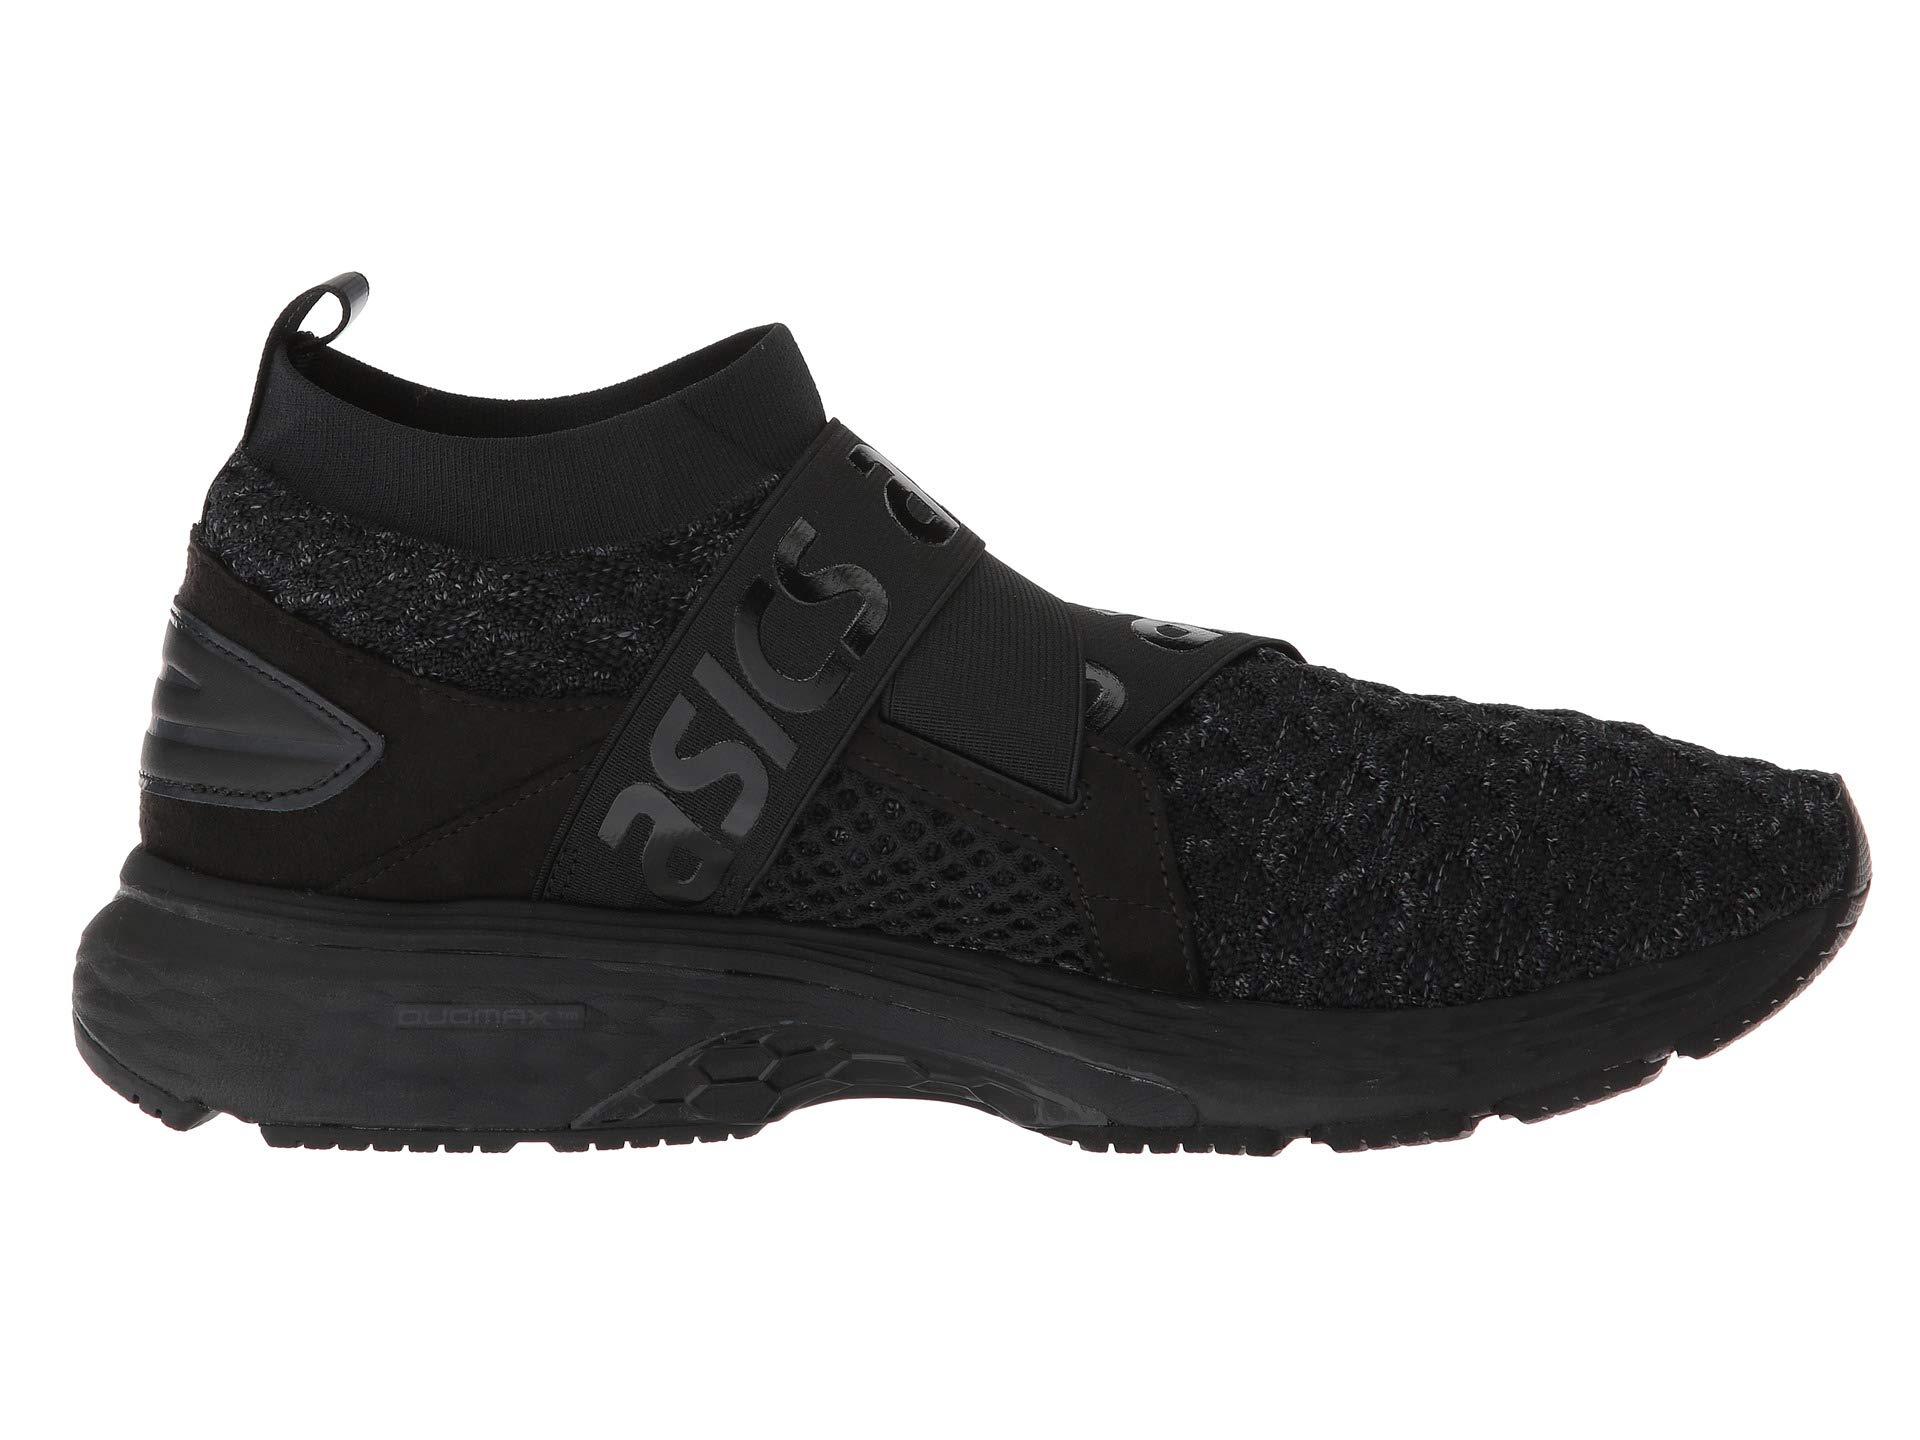 71MqlXAWz2L - ASICS Mens Gel-Kayano 25 Obistag Black/Carbon Running Shoe - 9